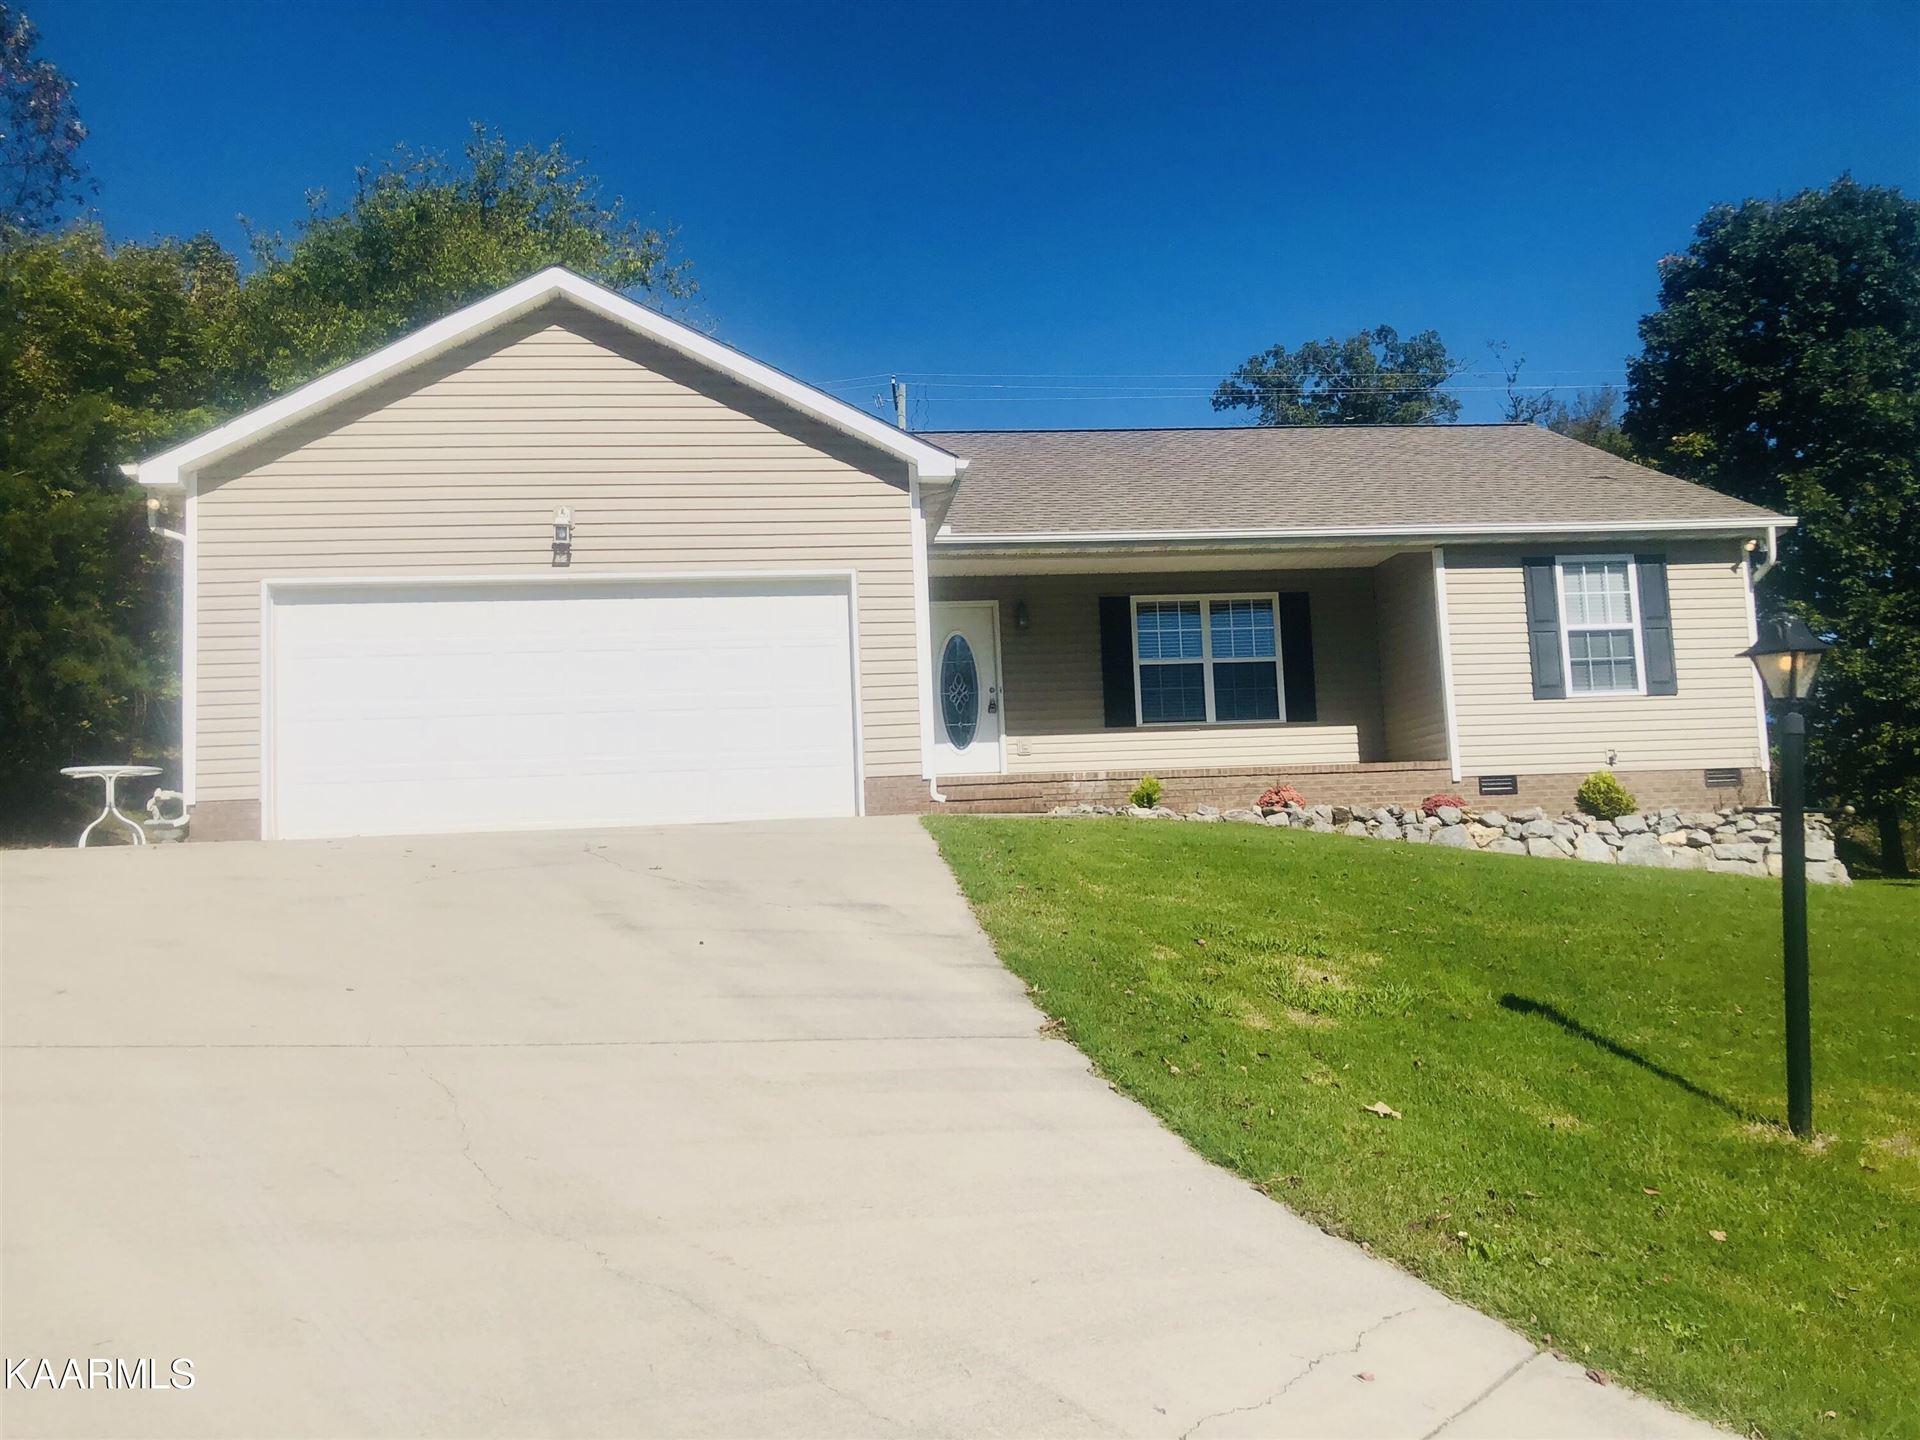 Photo of 3701 Stonebridge Drive, Powell, TN 37849 (MLS # 1170809)